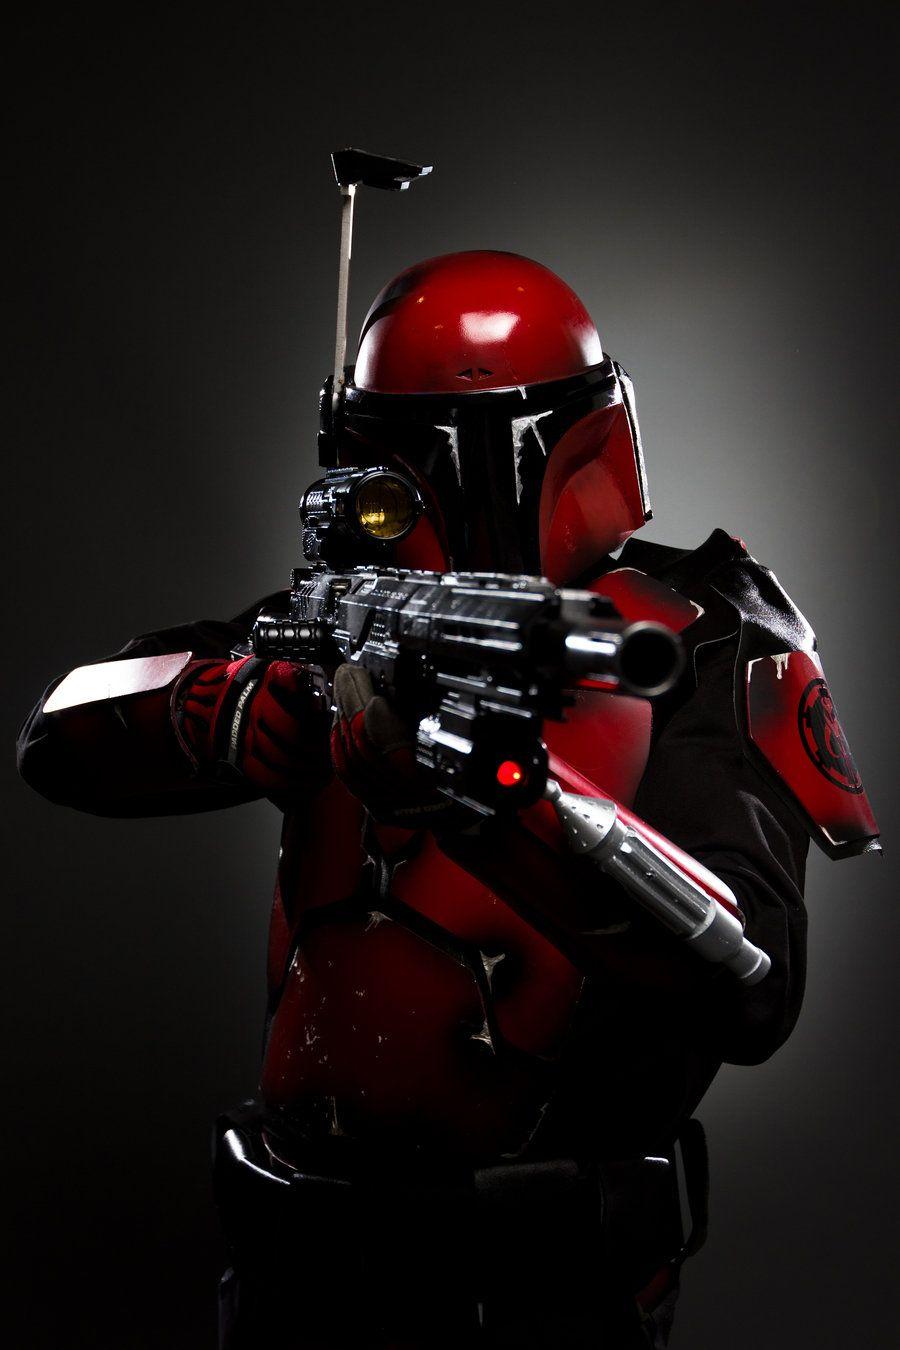 Mandalorian By Convokephoto On Deviantart Star Wars Images Star Wars Trooper Star Wars